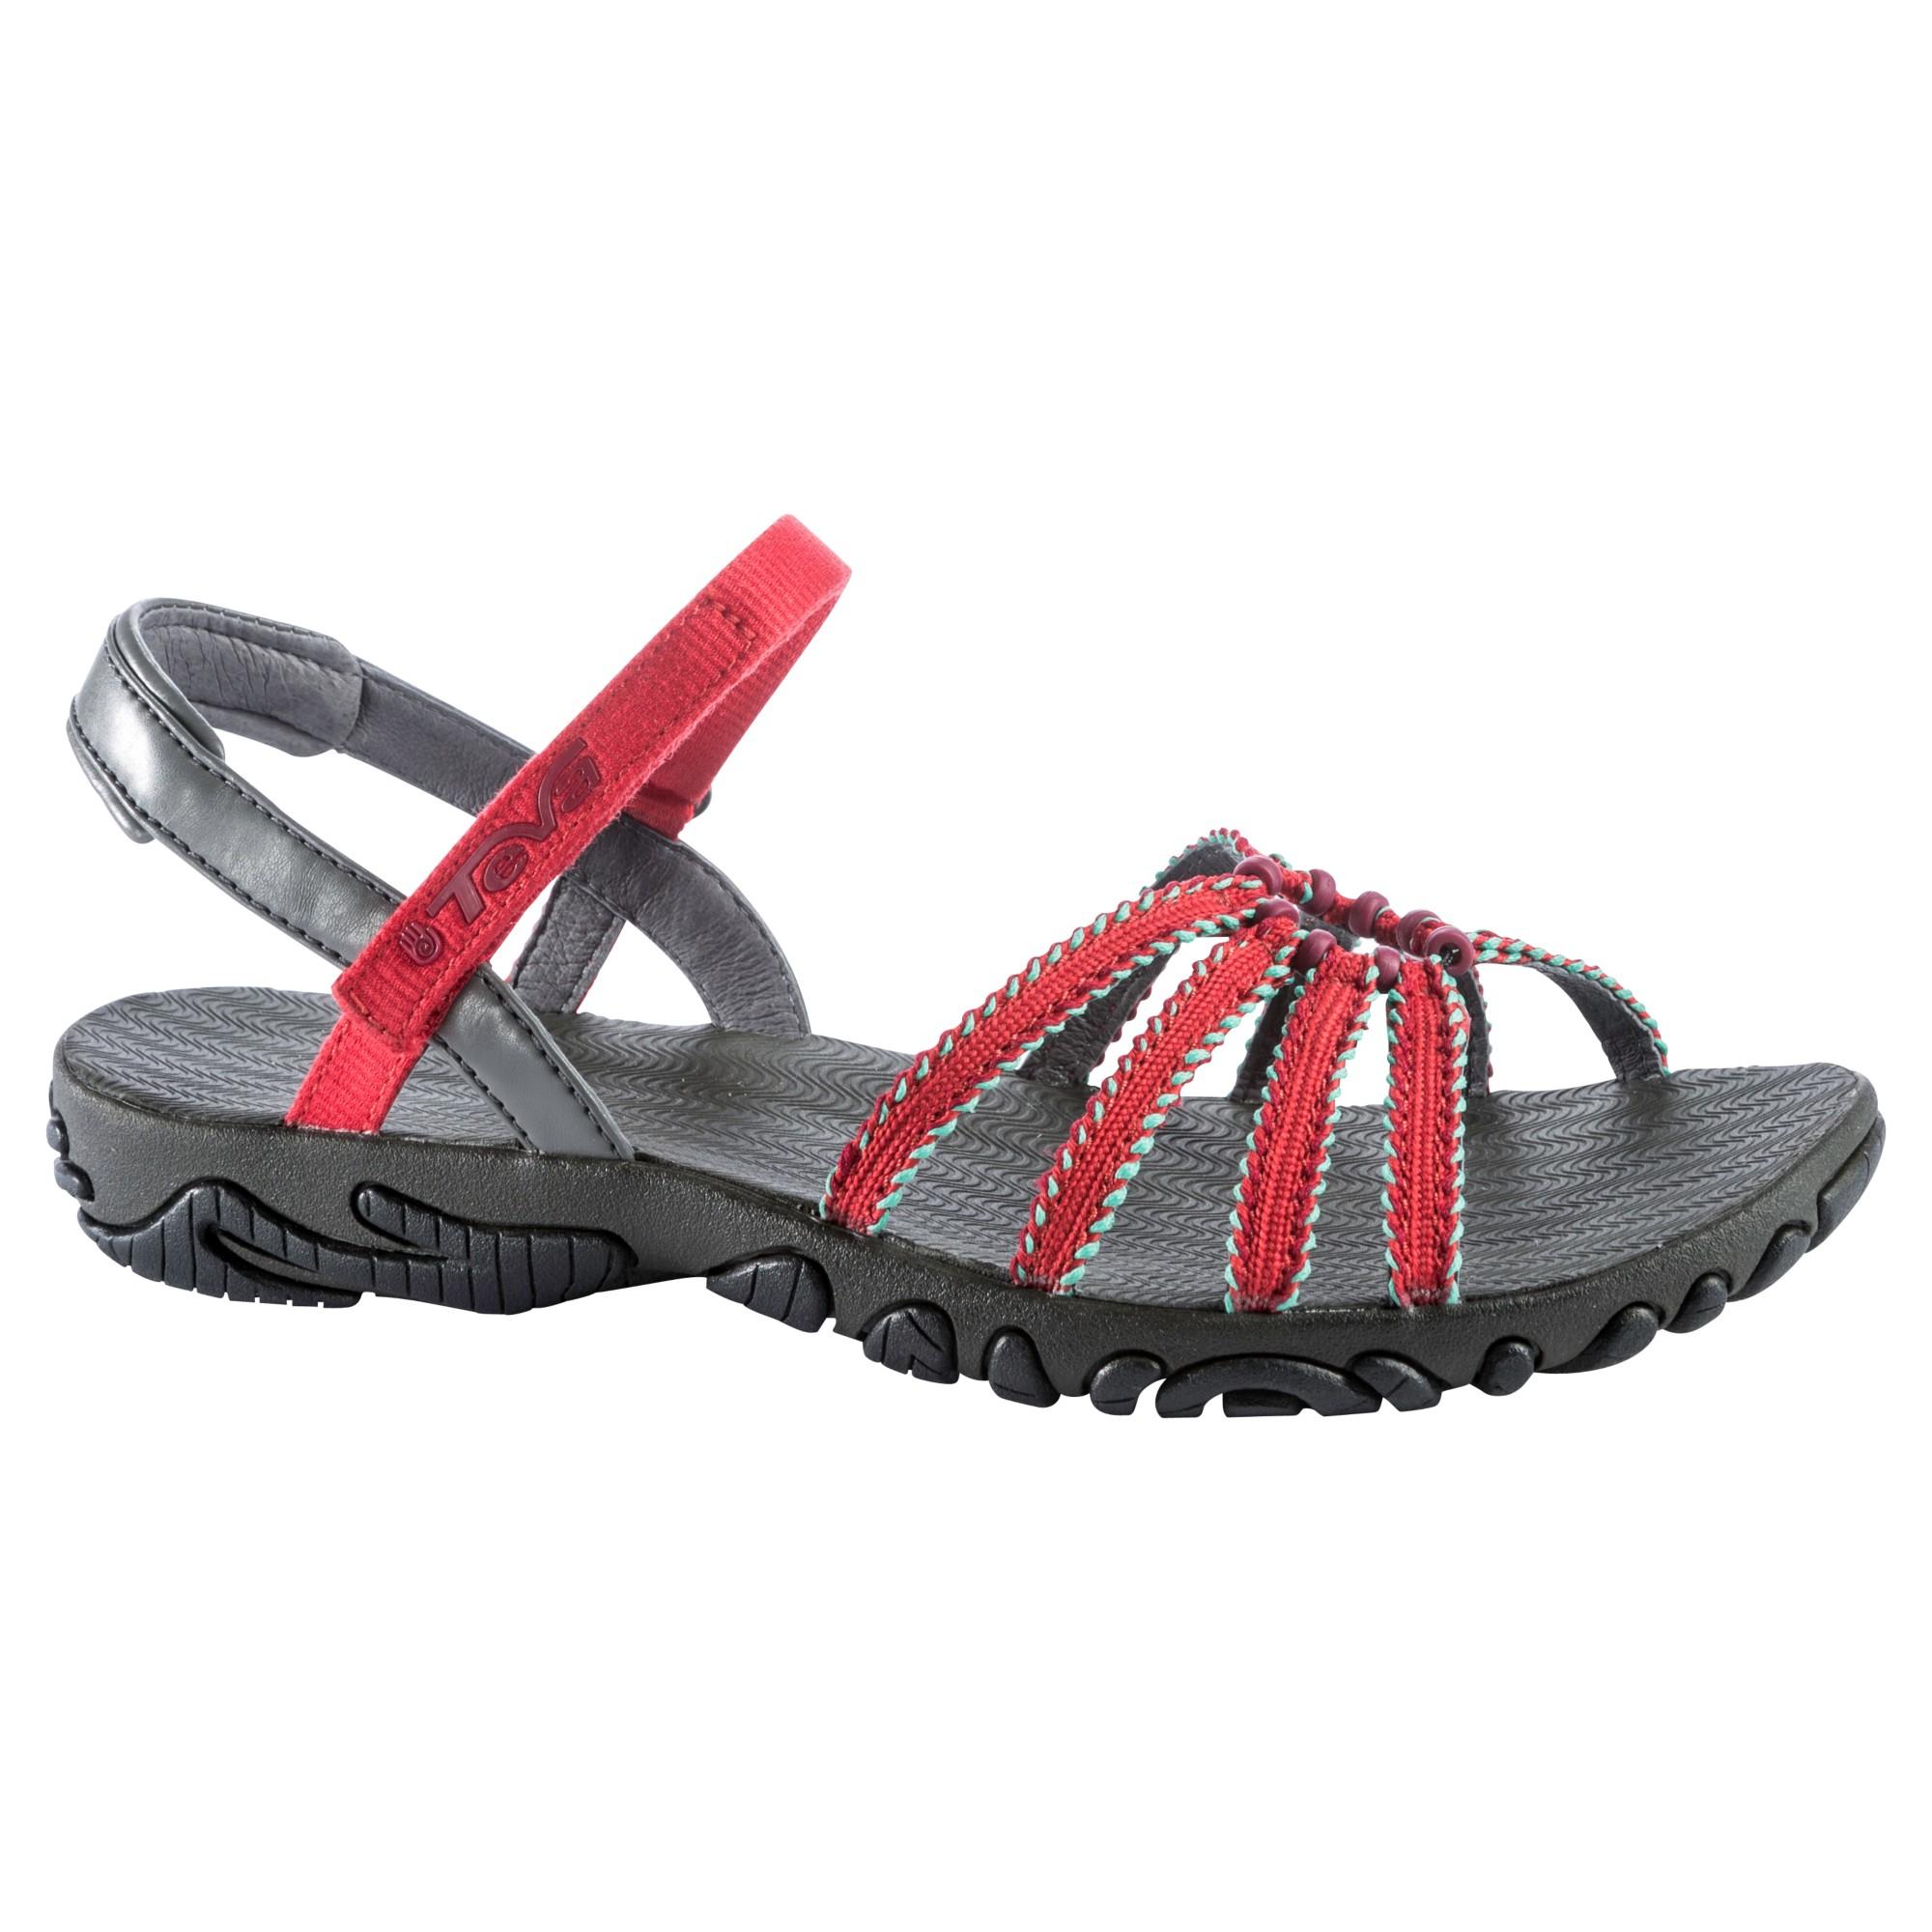 c6dc3fe498e8 Teva Kayenta Dream Weave Womens Sandals in Red - Lyst